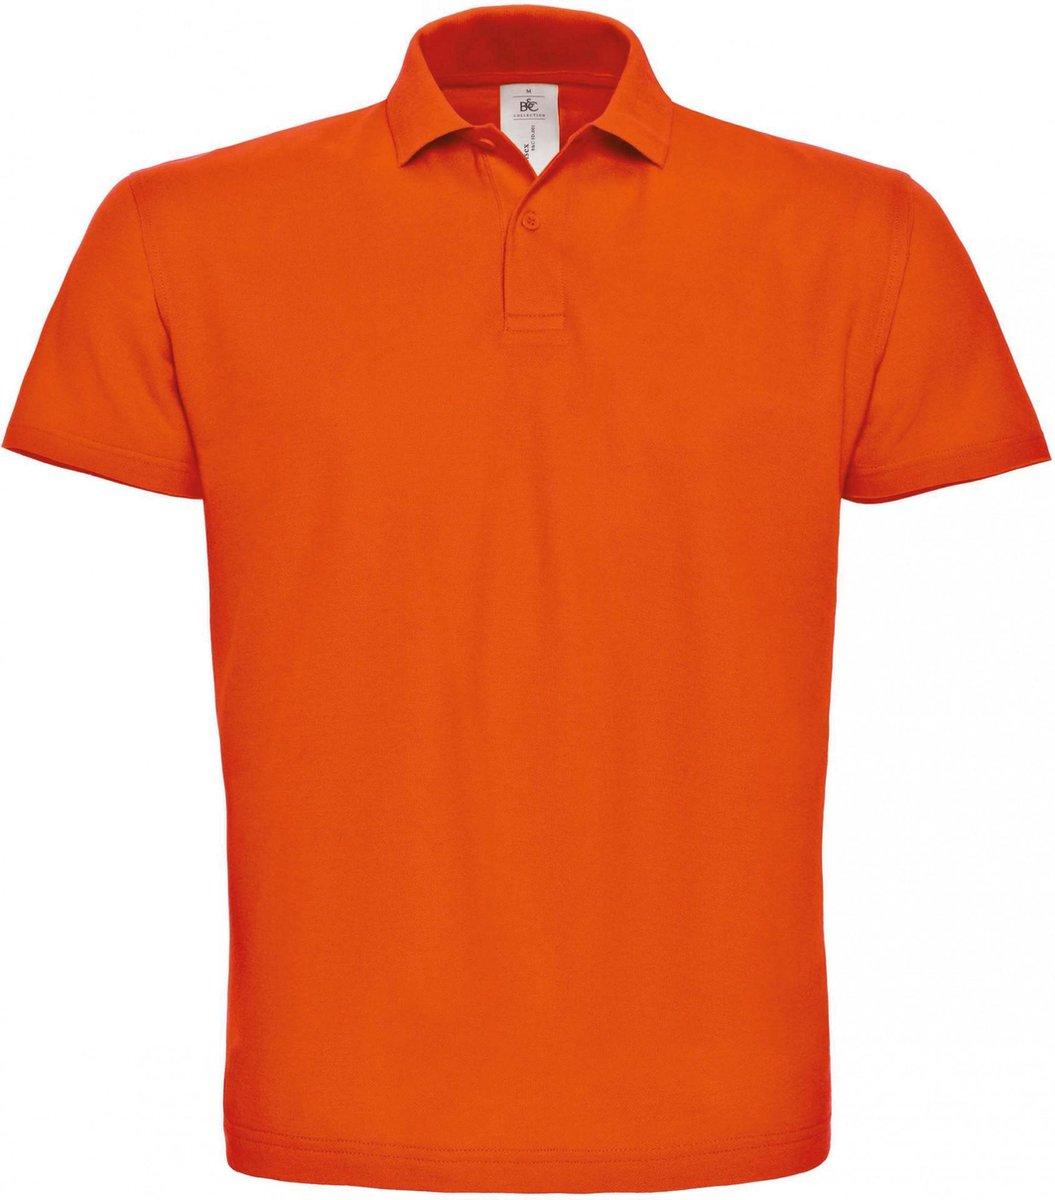 B&C Heren Oranje Polo REGULAR FIT Maat XXXXL (4XL) 100 % Katoen